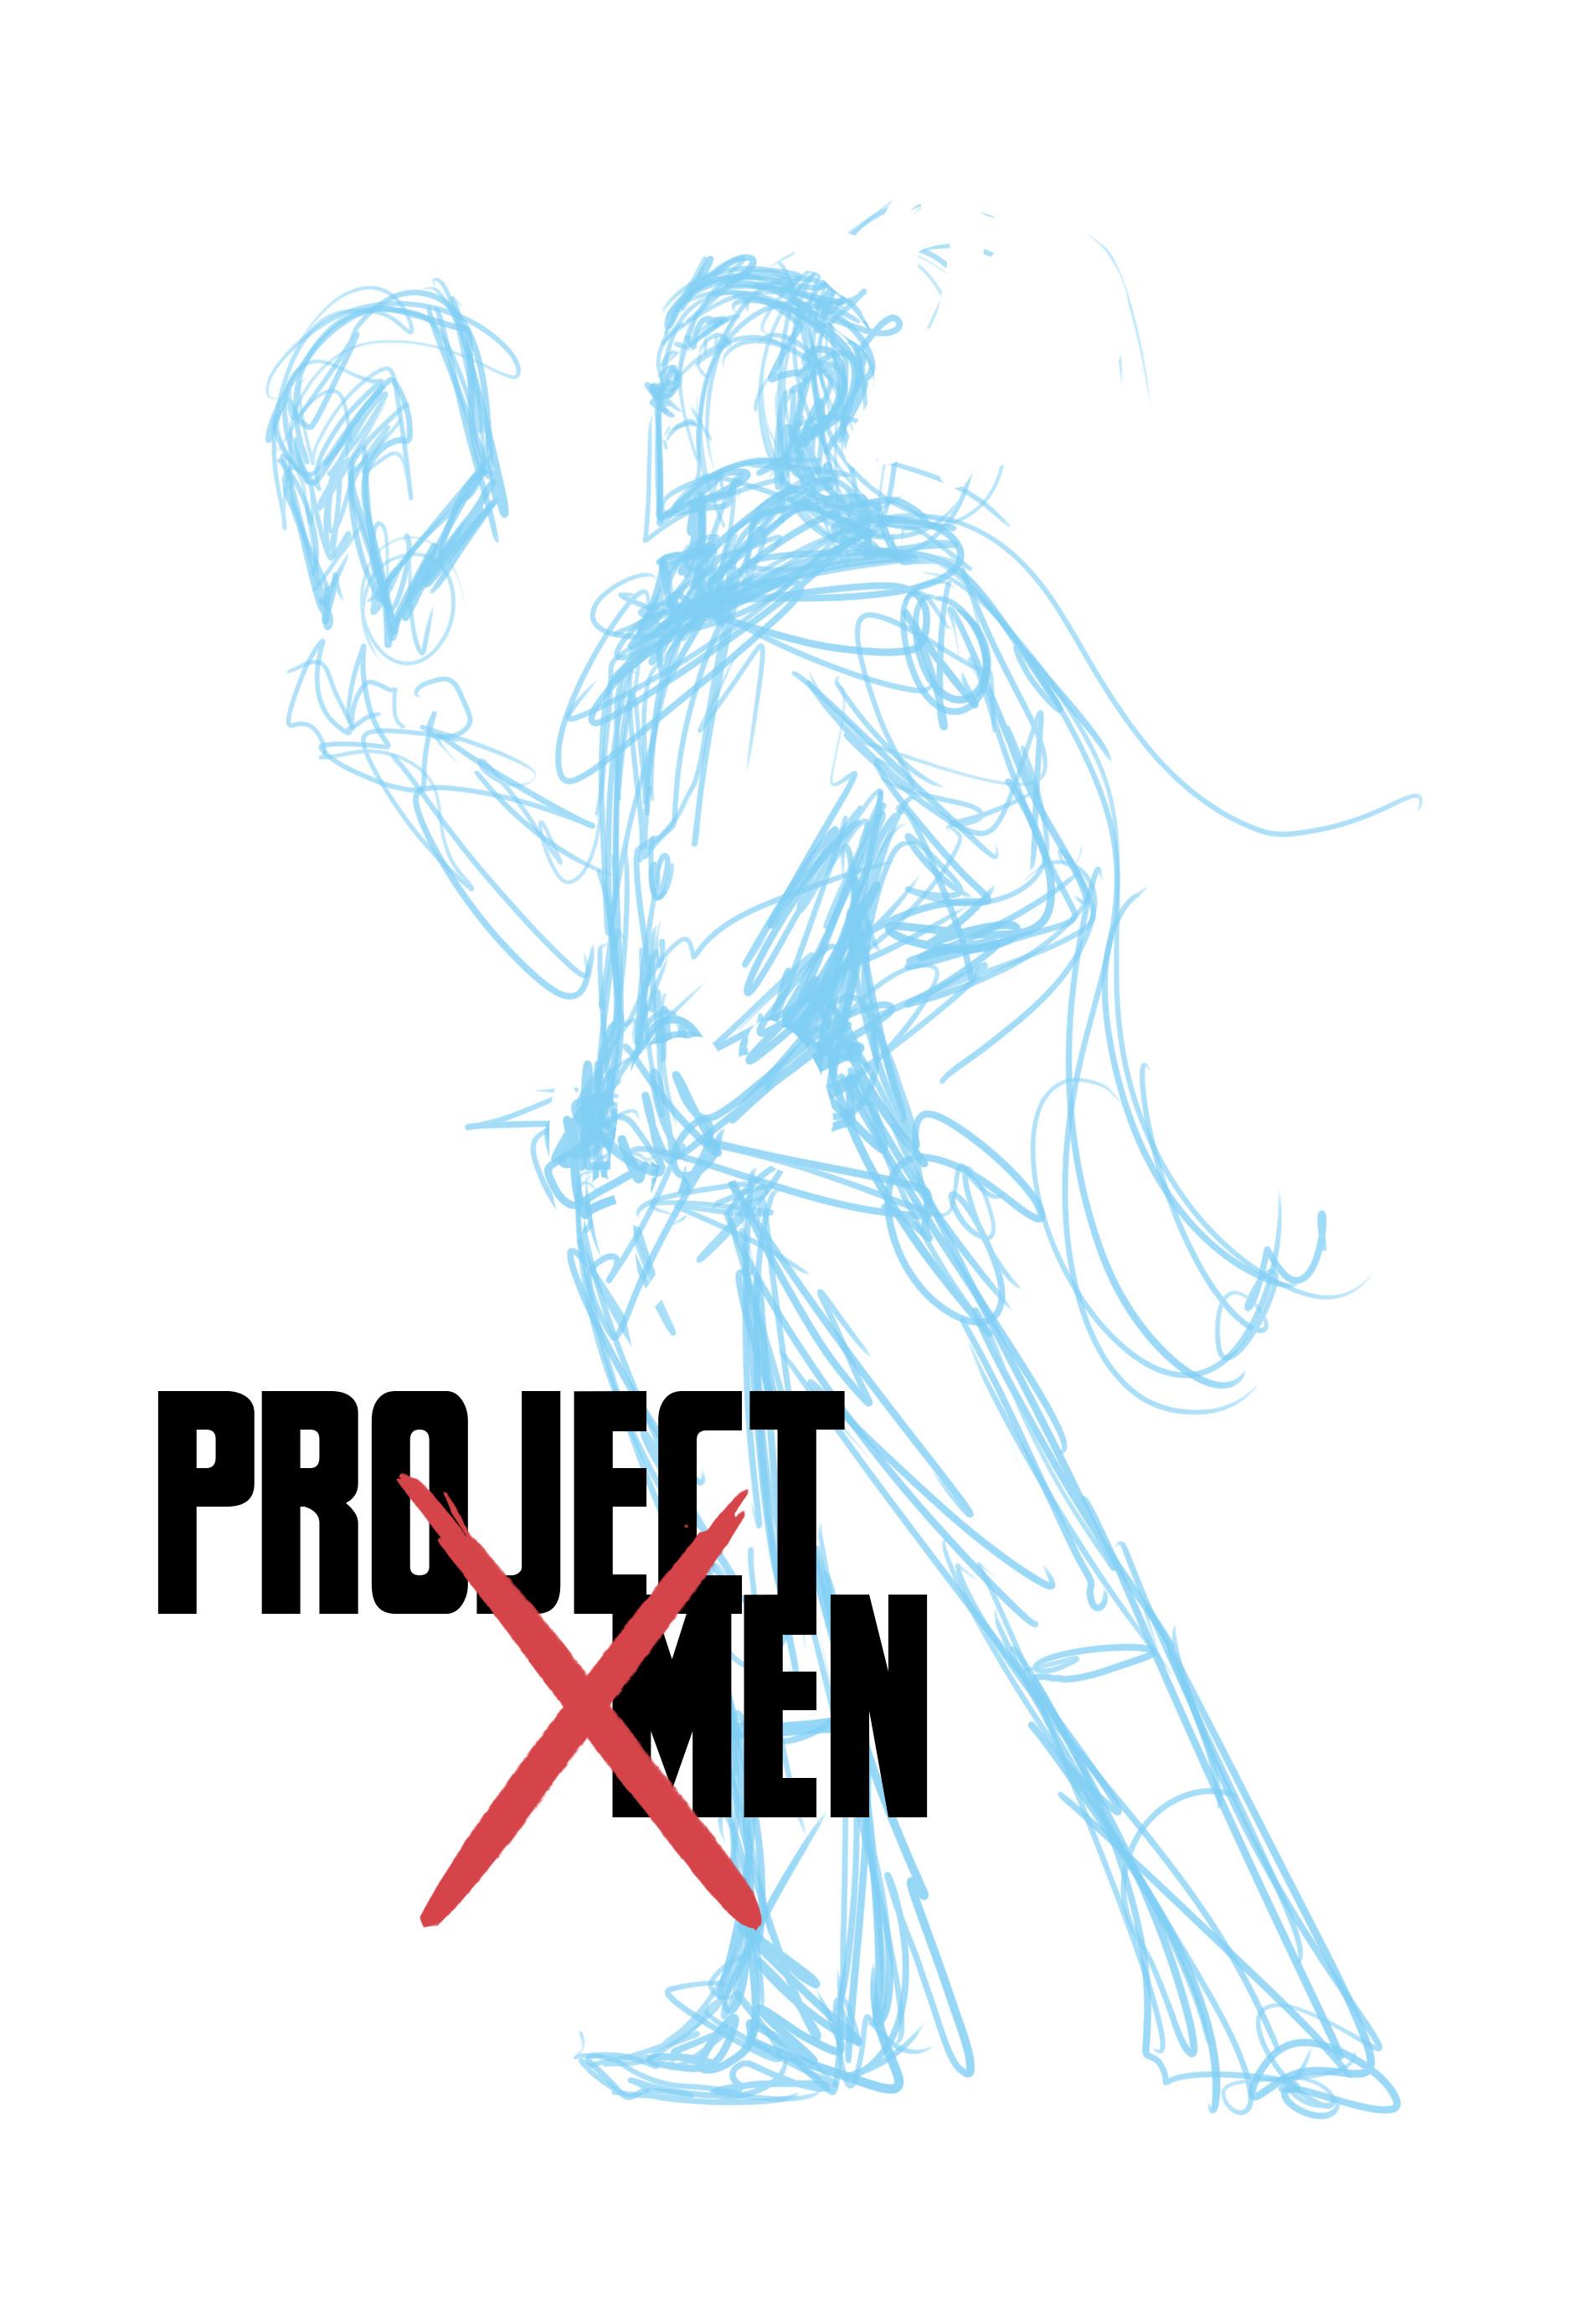 Rashx doucet projectxmen magneto